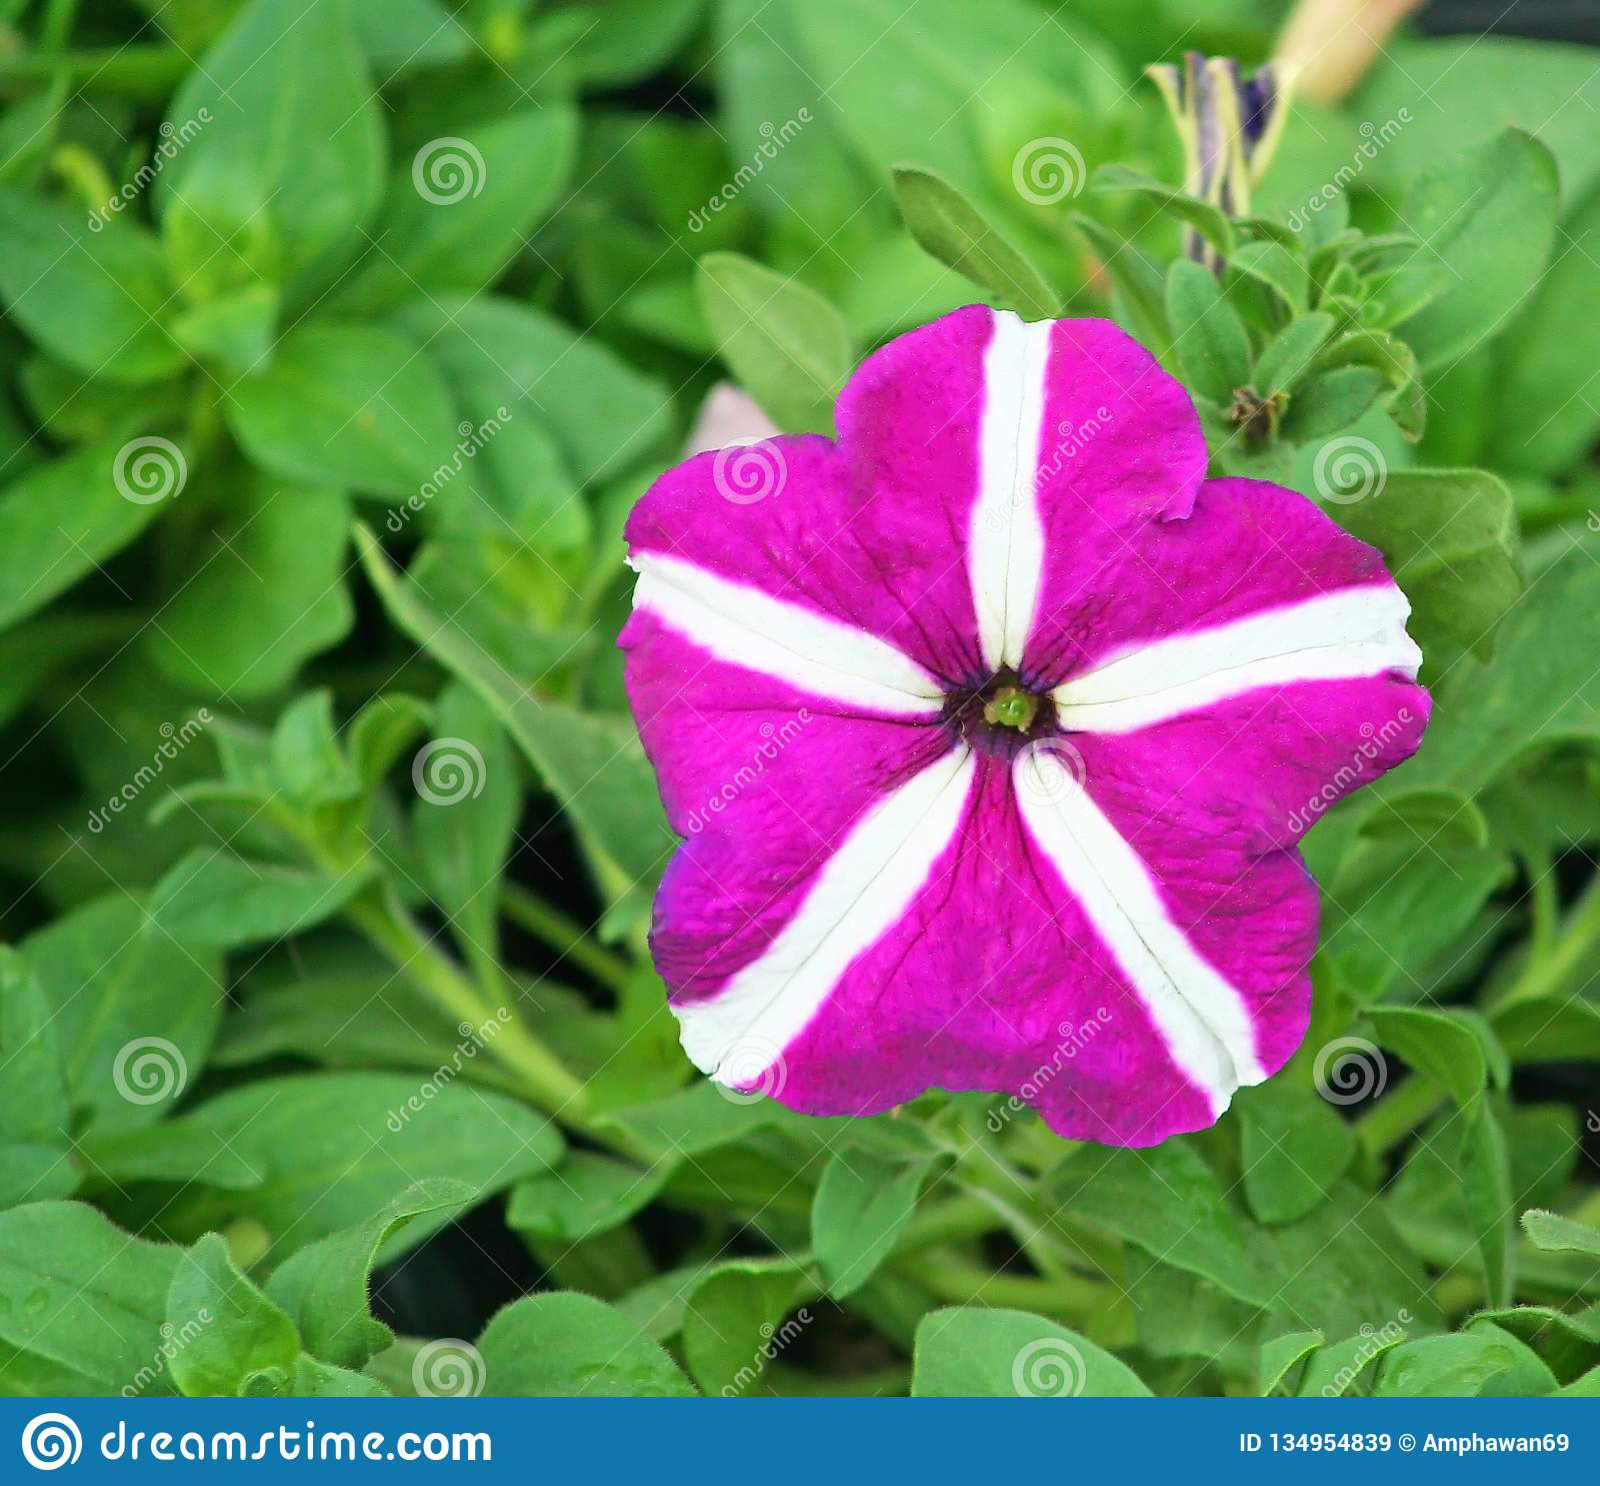 Purple petunia flower on green leaves background